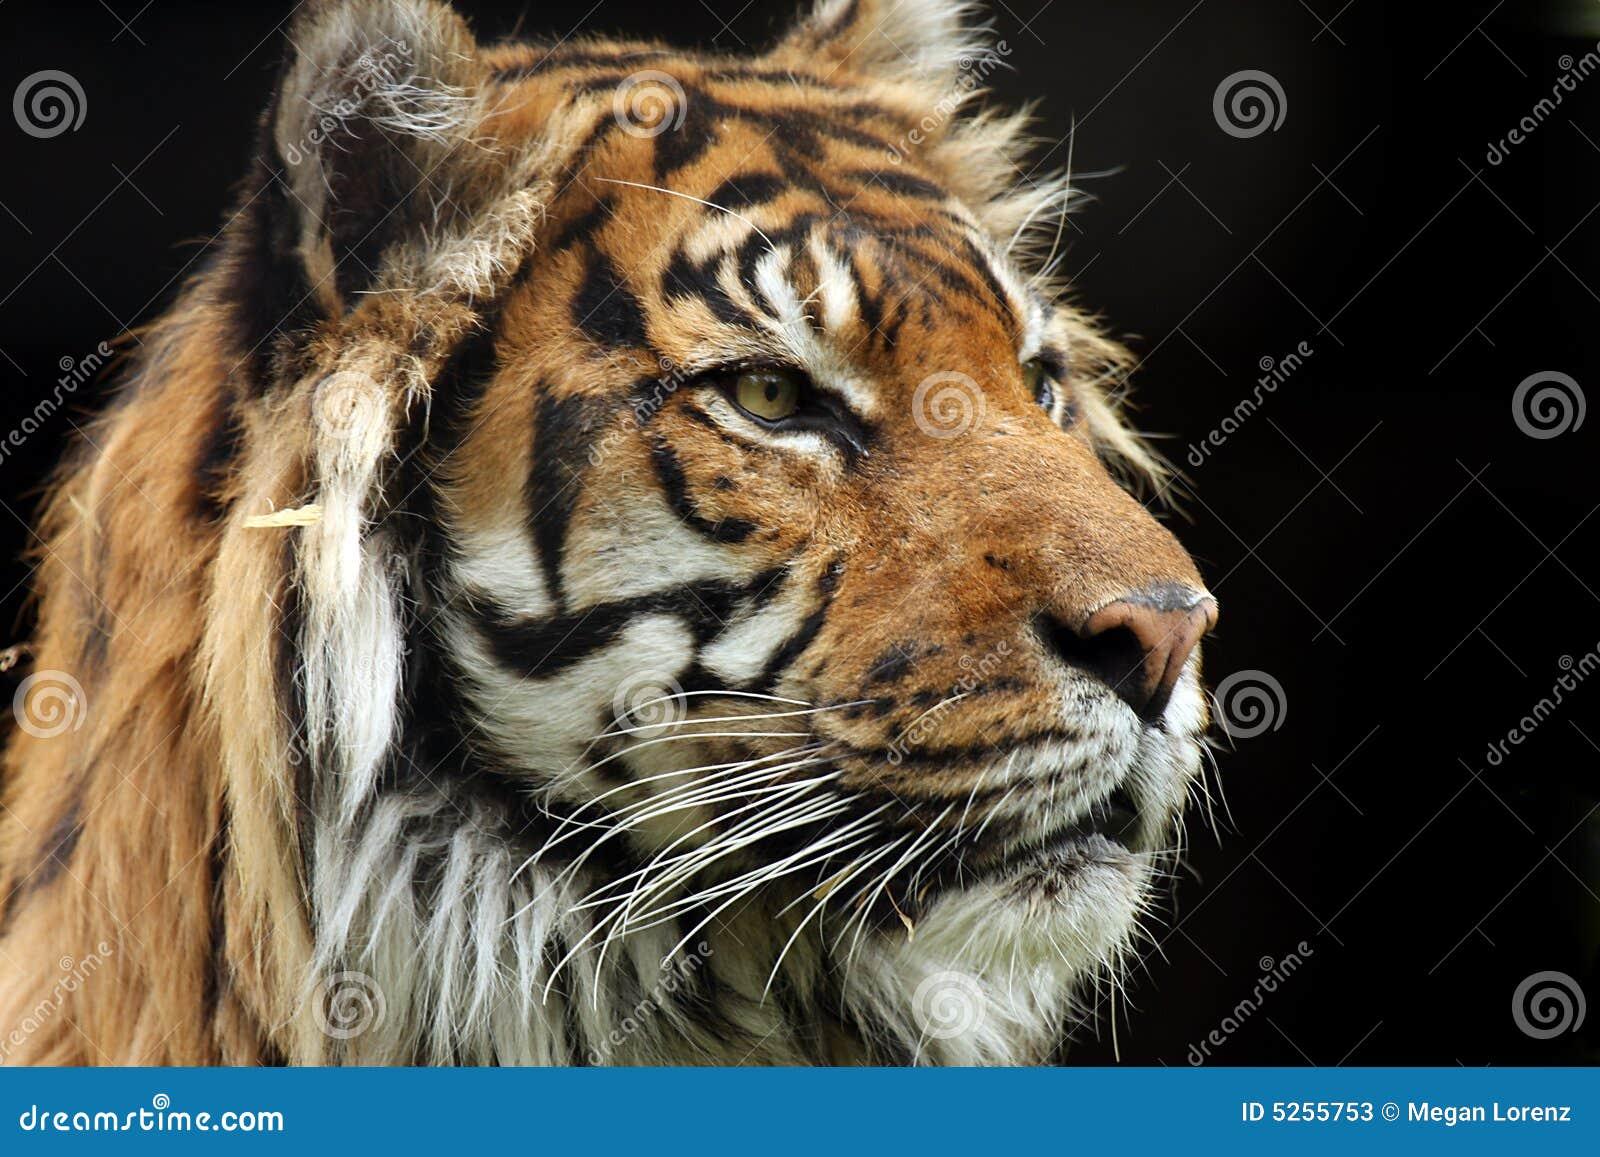 Majestic Tiger Stock Photos - Image: 5255753